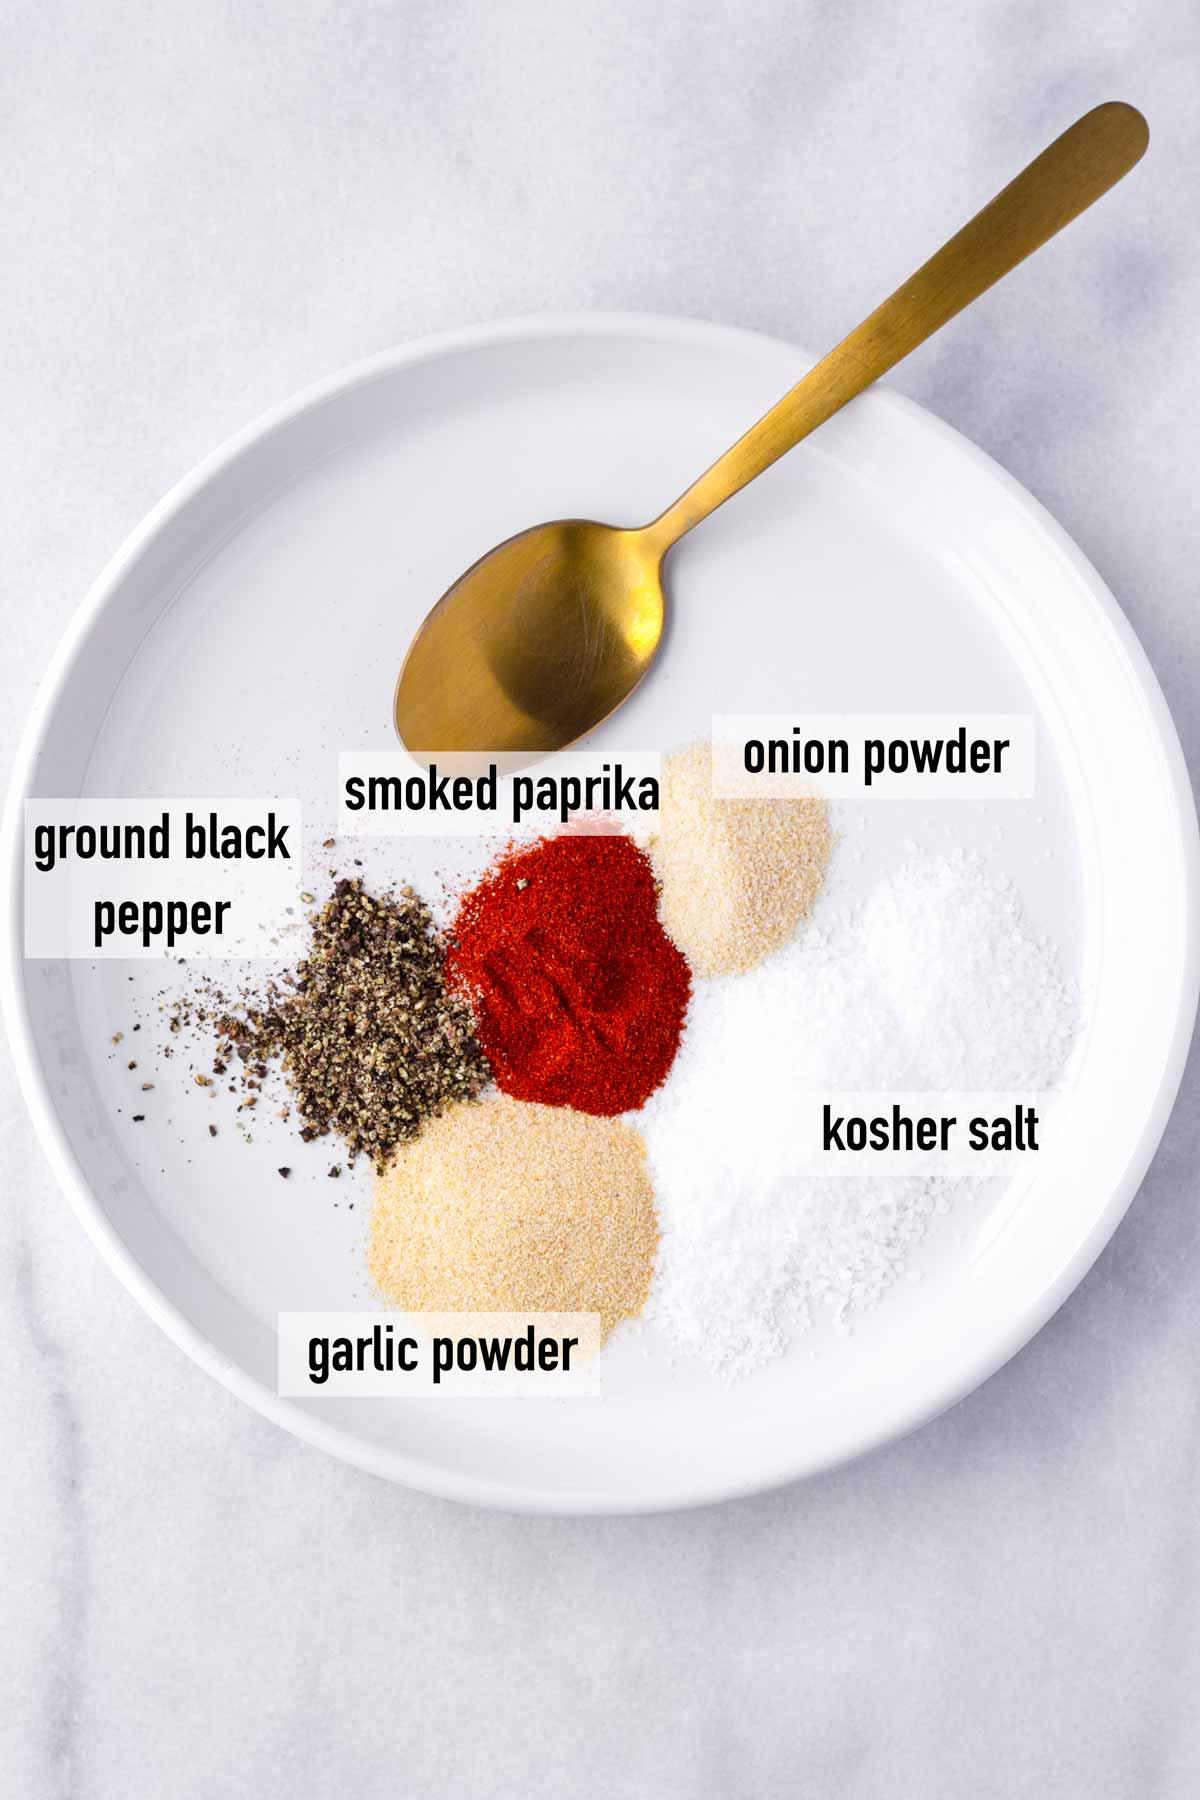 labeled black pepper, paprika, garlic powder, onion powder, salt and pepper arranged on a plate